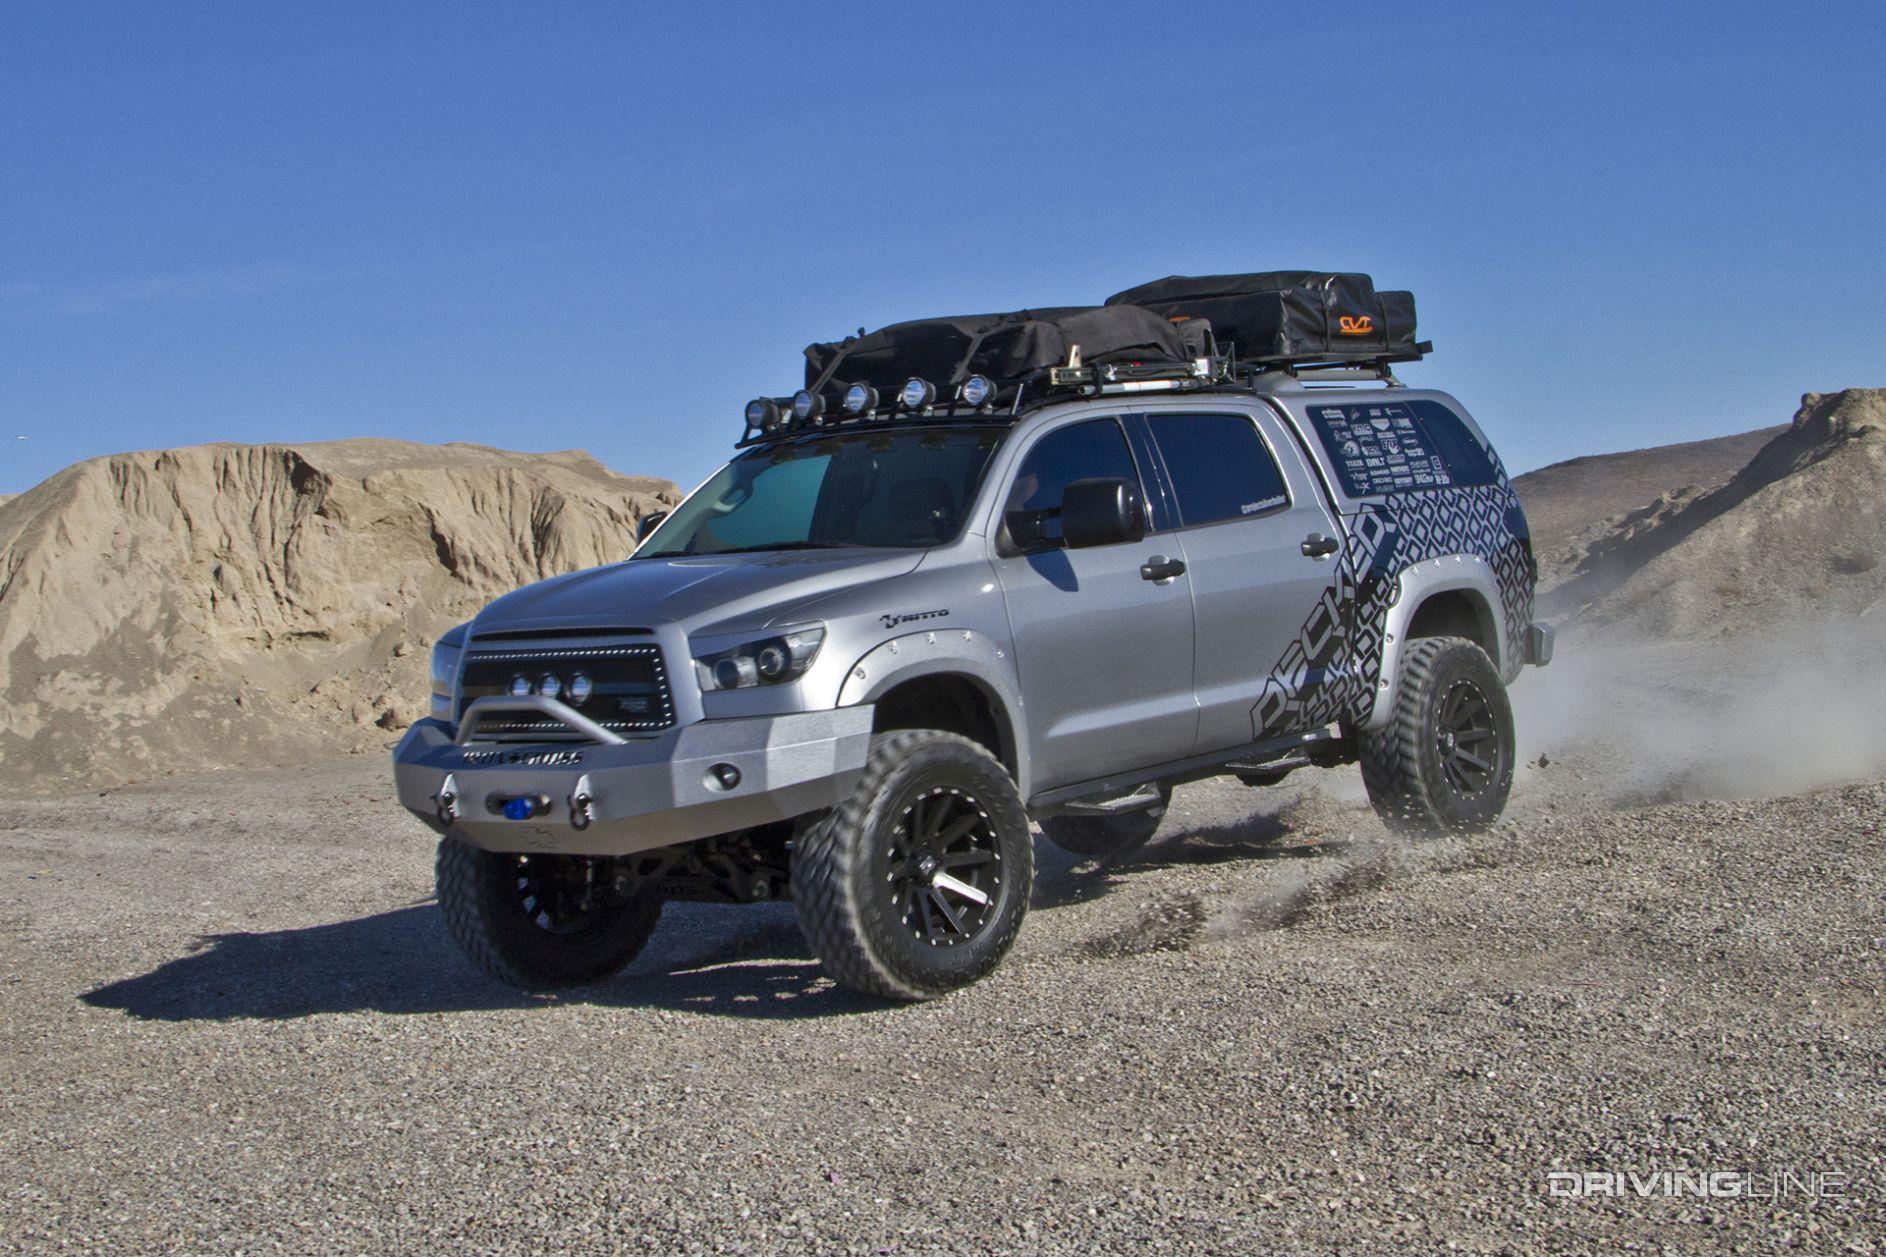 Best Truck Camper For Toyota Tundra Toyota Tundra Camper